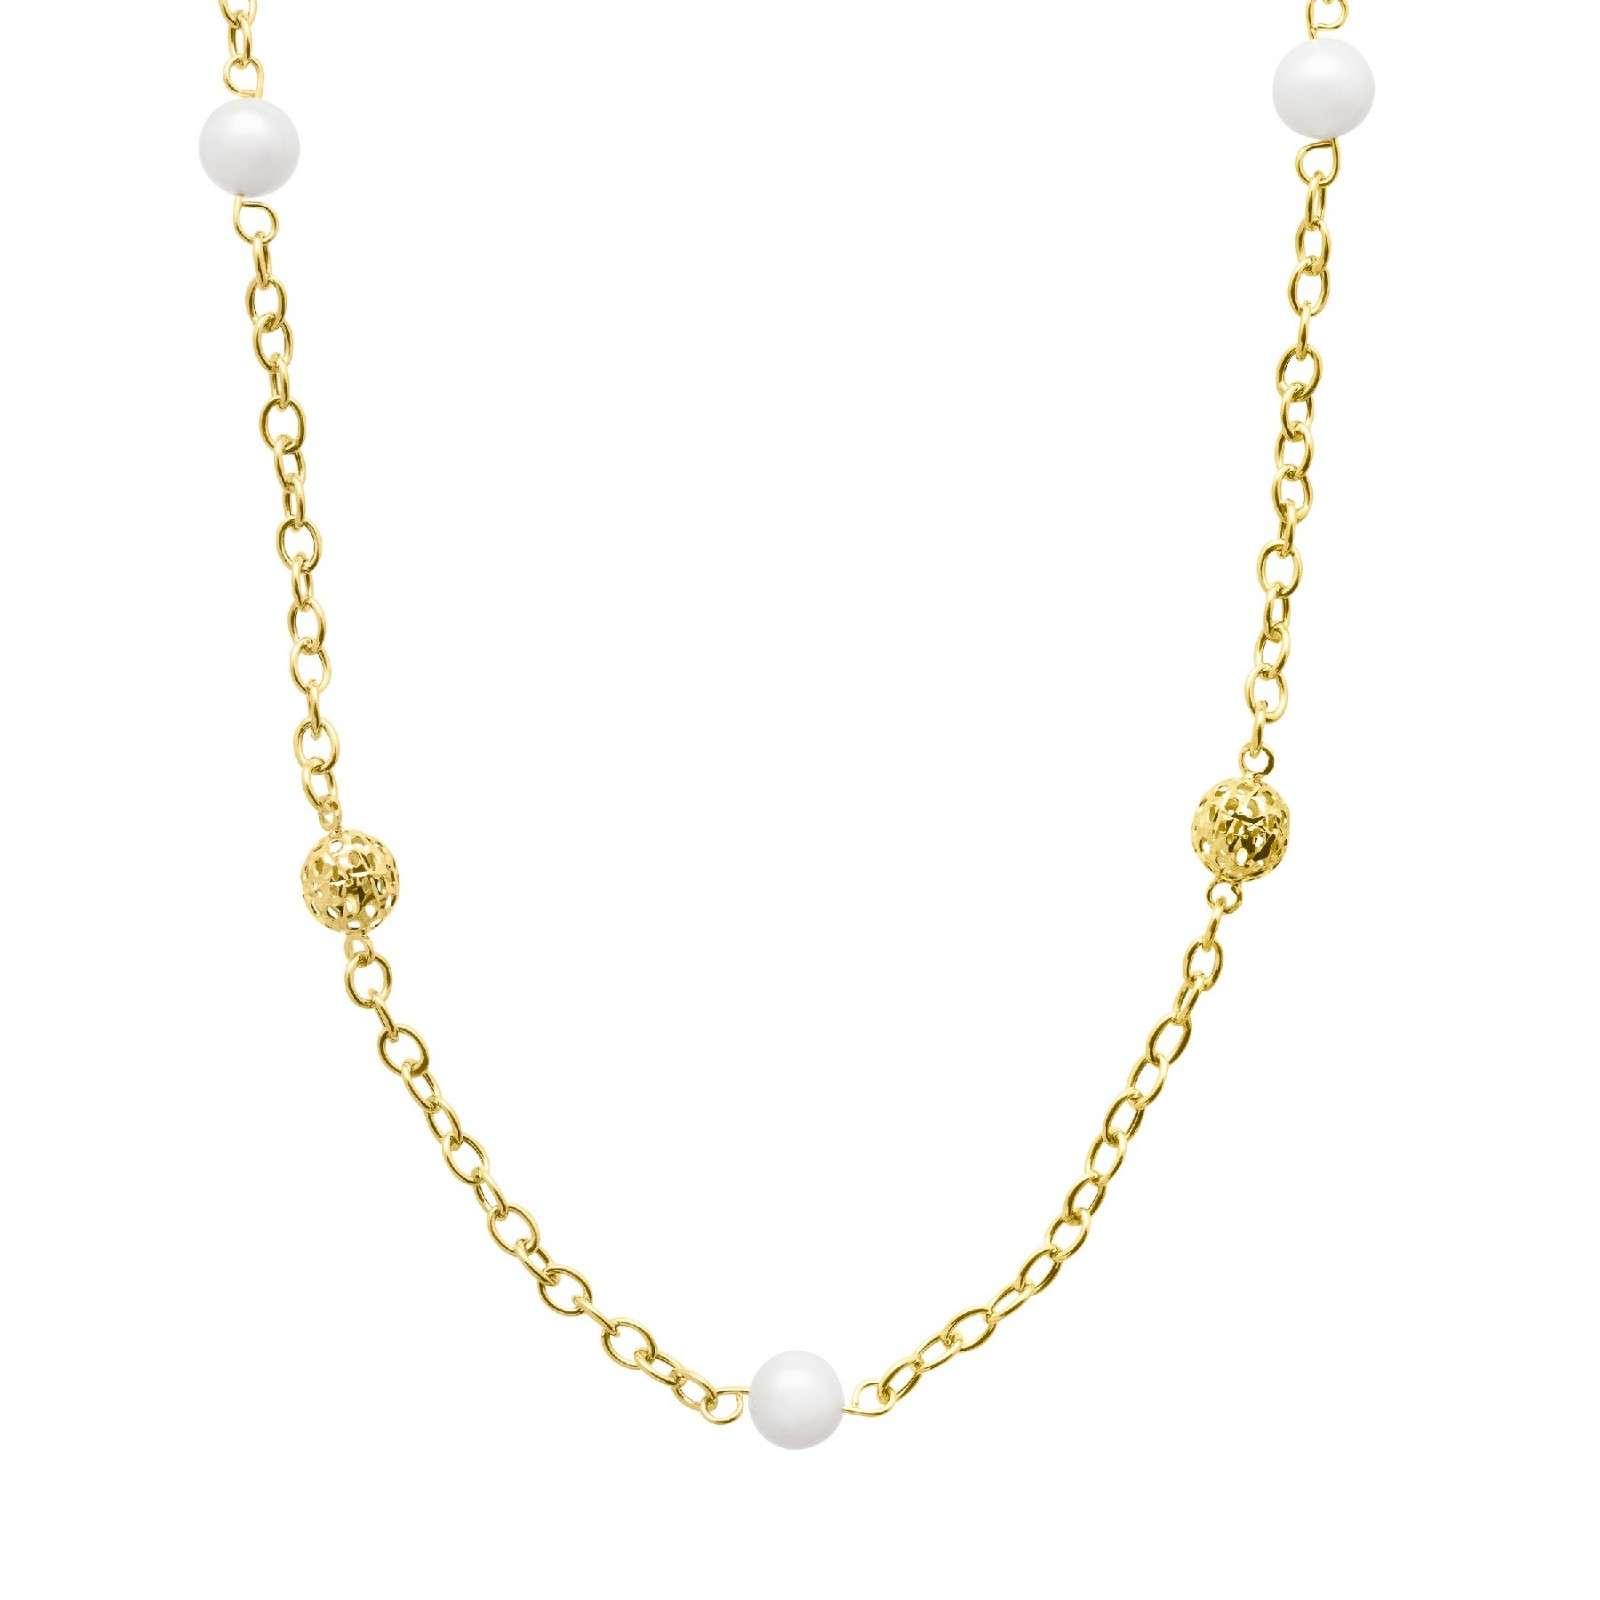 7mm珍珠项链